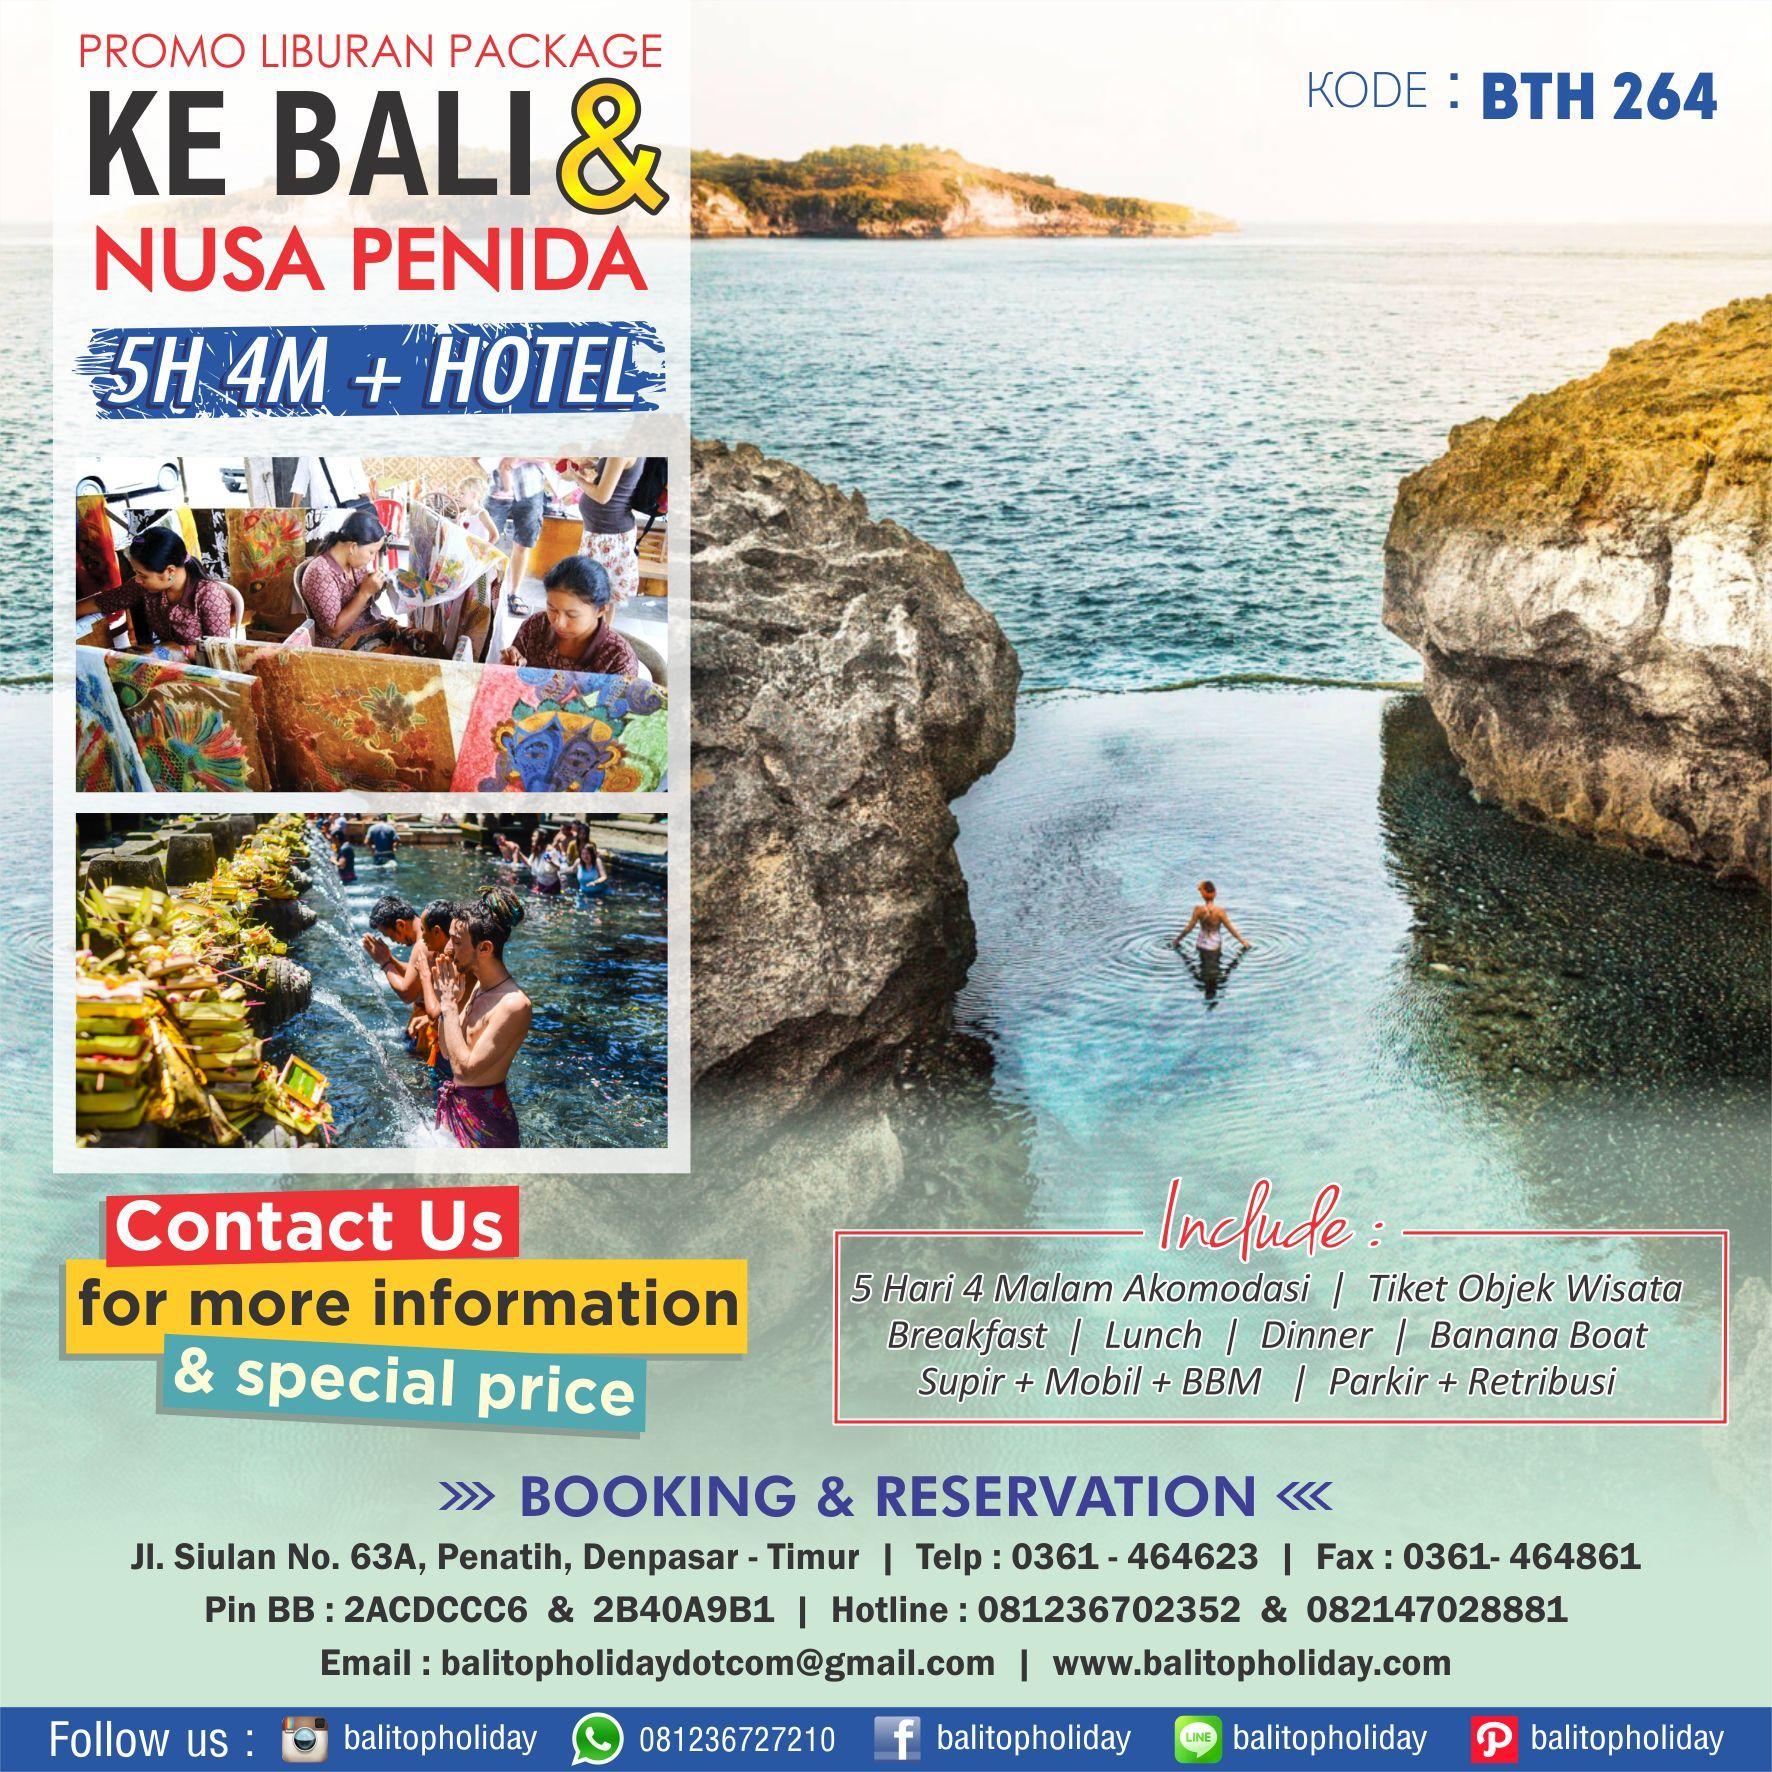 Paket Tour Bali 5 Hari 4 Malam 3 Baru Nusa Penida